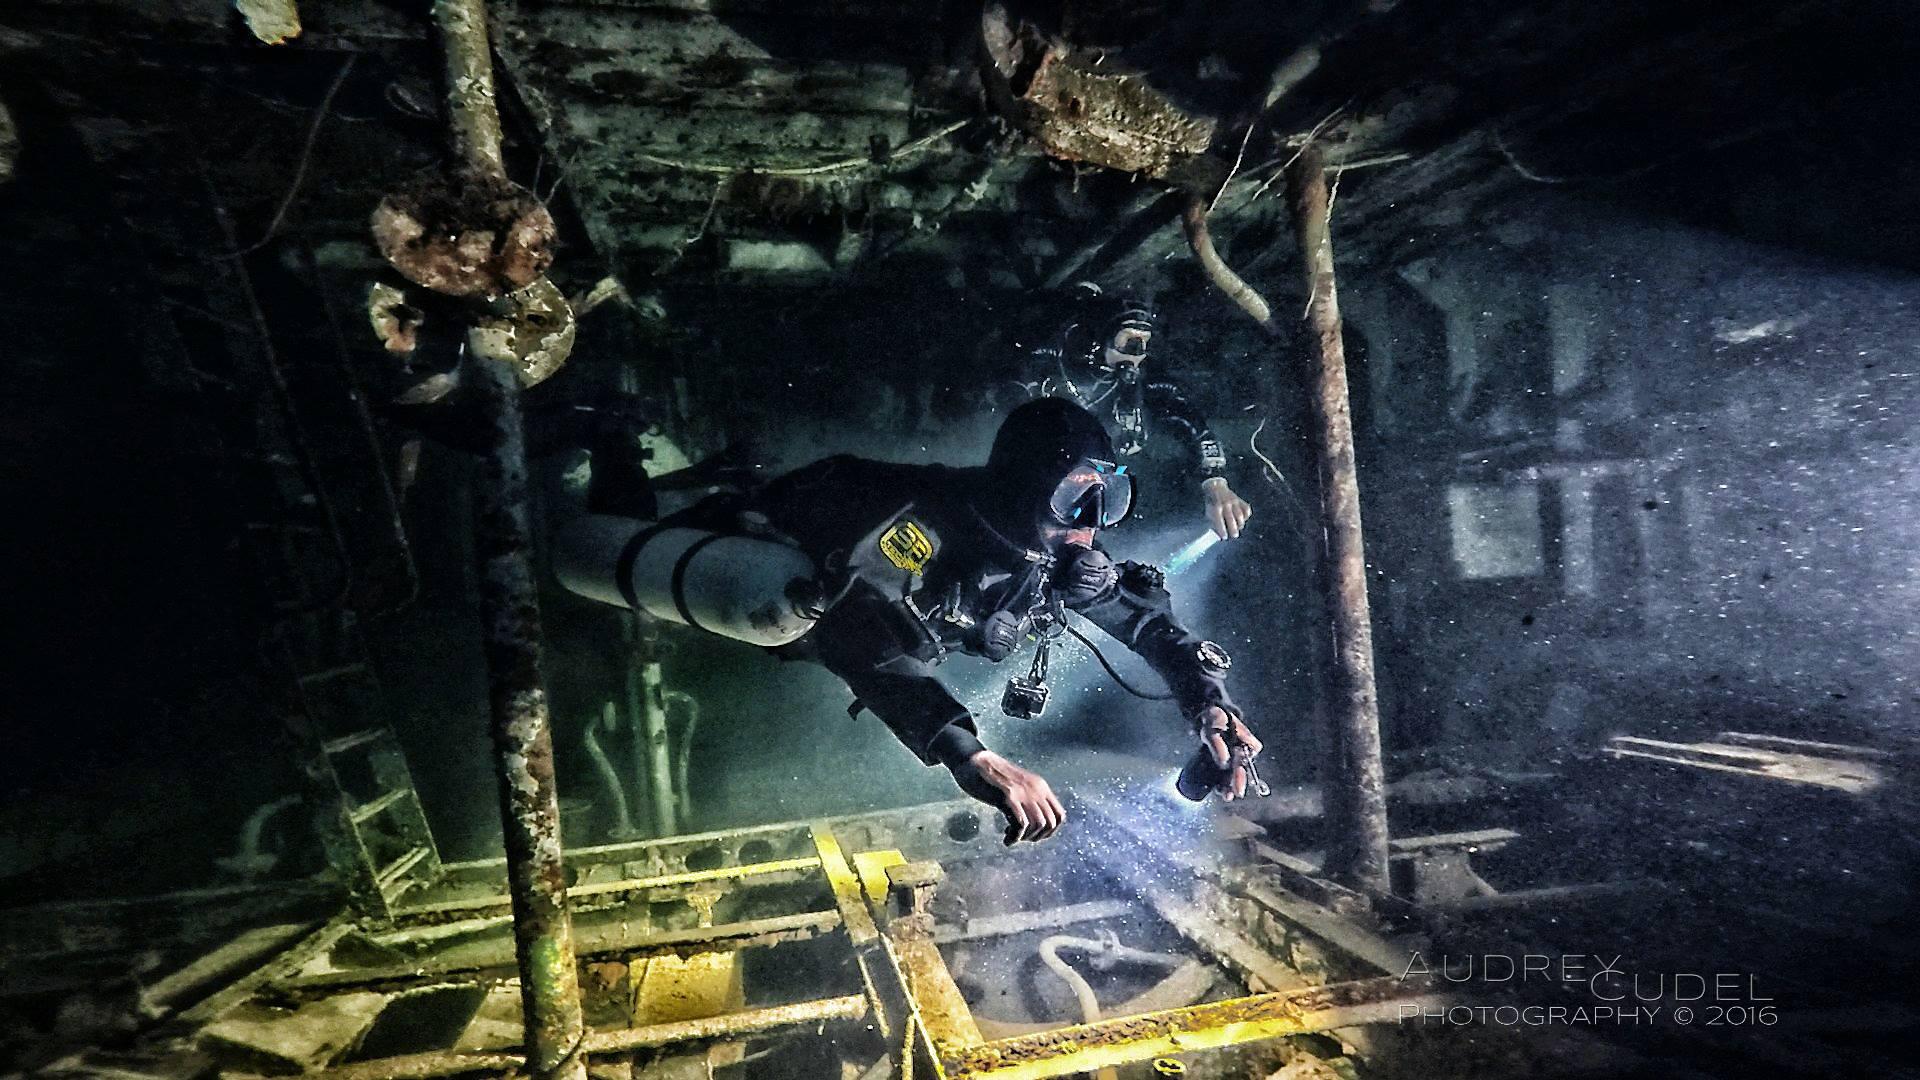 The Author diving the Karwela Wreck Gozo, Malta. Image credit  Audrey Cudel